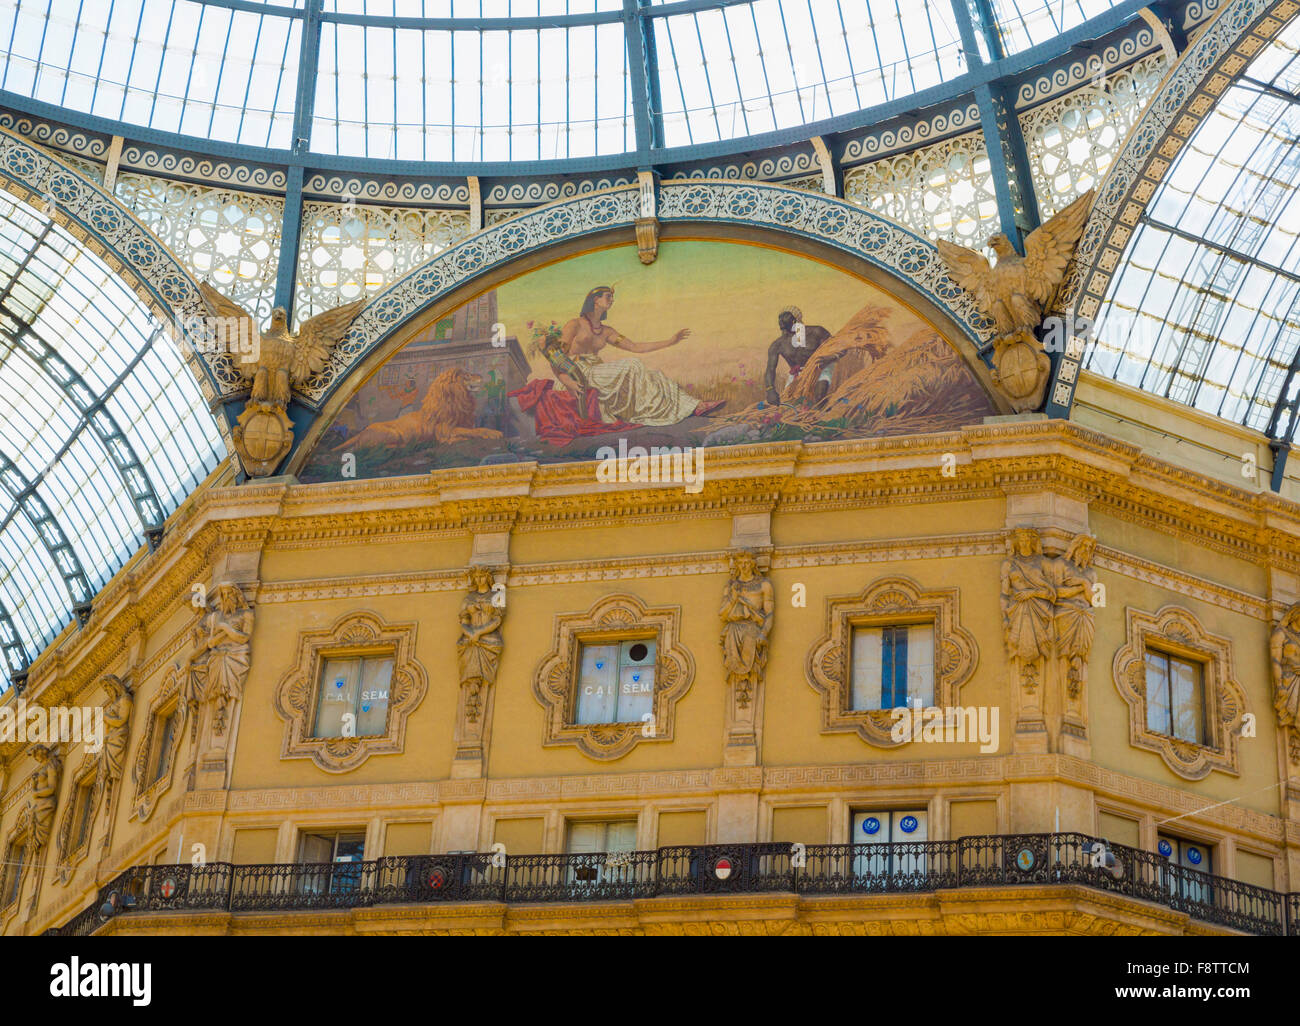 Milan, Milan Province, Lombardy, Italy.  Galleria Vittorio Emanuele II shopping arcade. Allegorical fresco representing - Stock Image